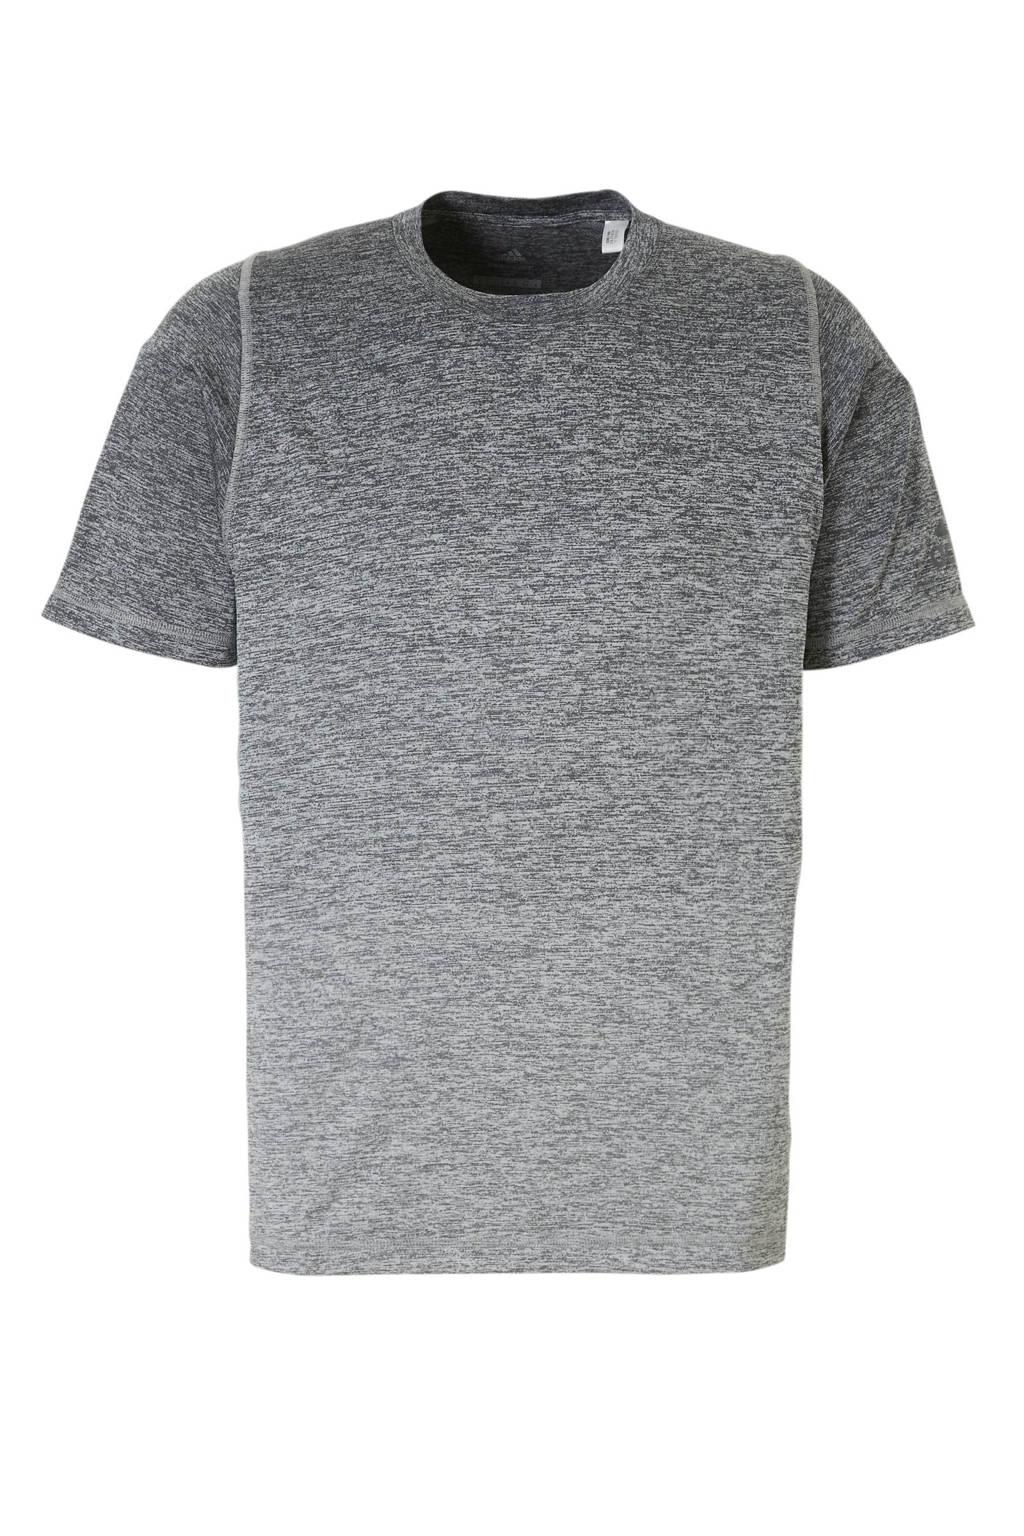 adidas performance   sport T-shirt  grijs, Antraciet/grijs melange